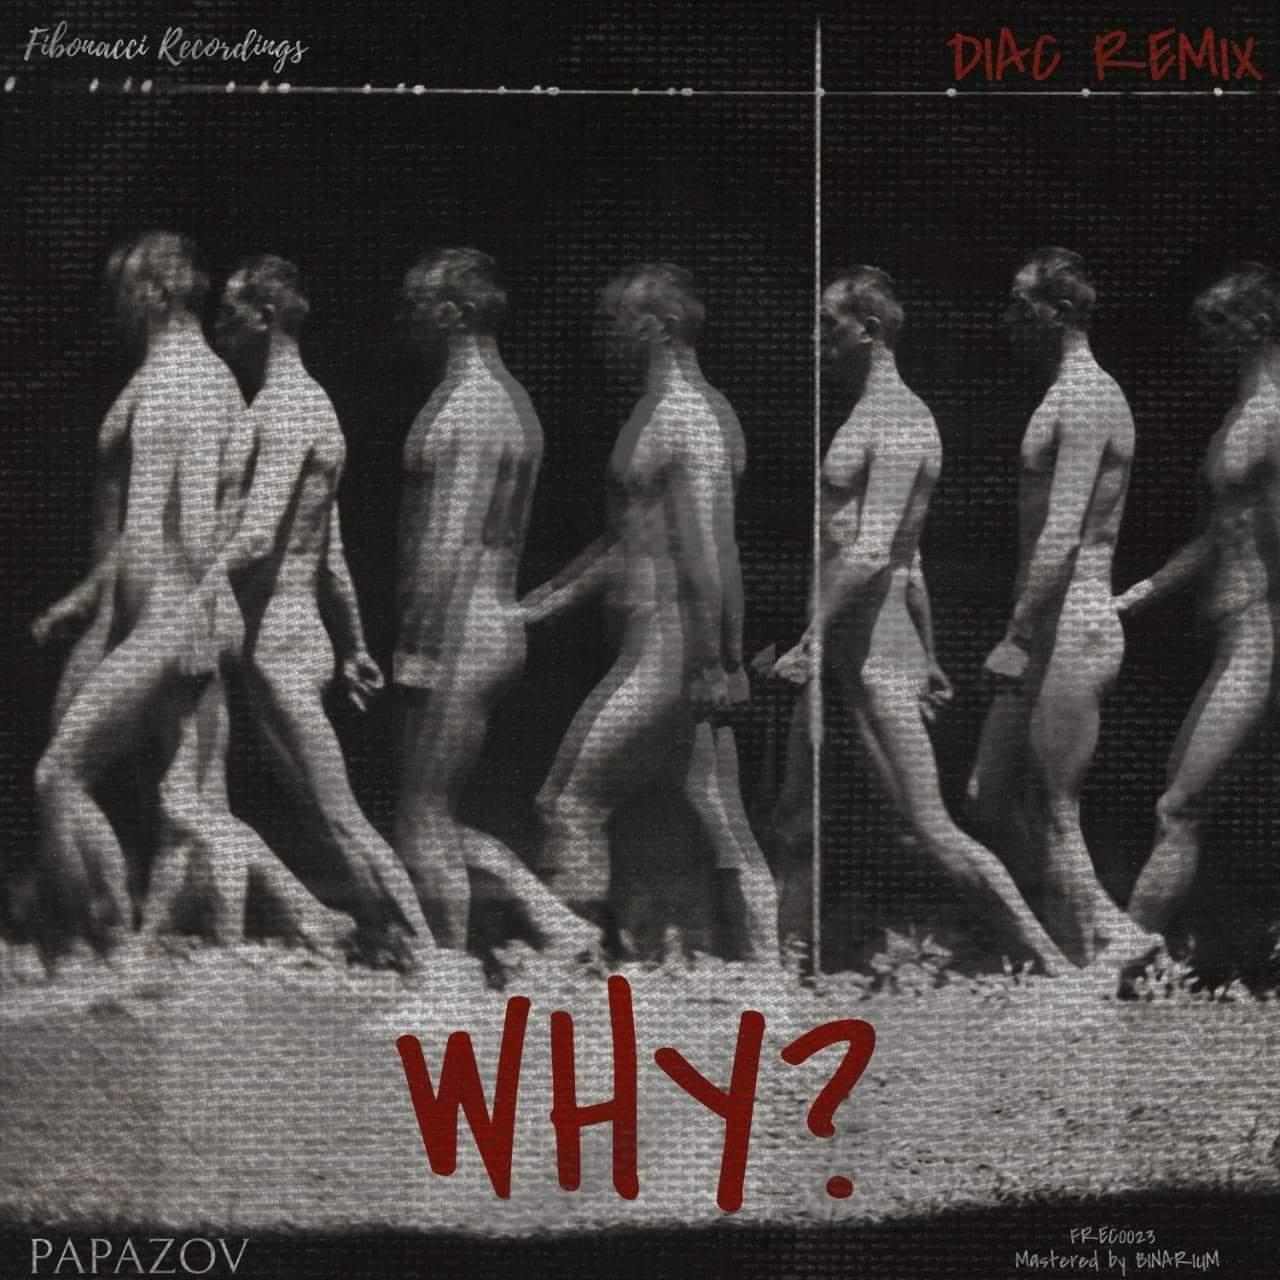 PREMIERE: Papazov - Why (Diac Remix) [Fibonacci Recordings]